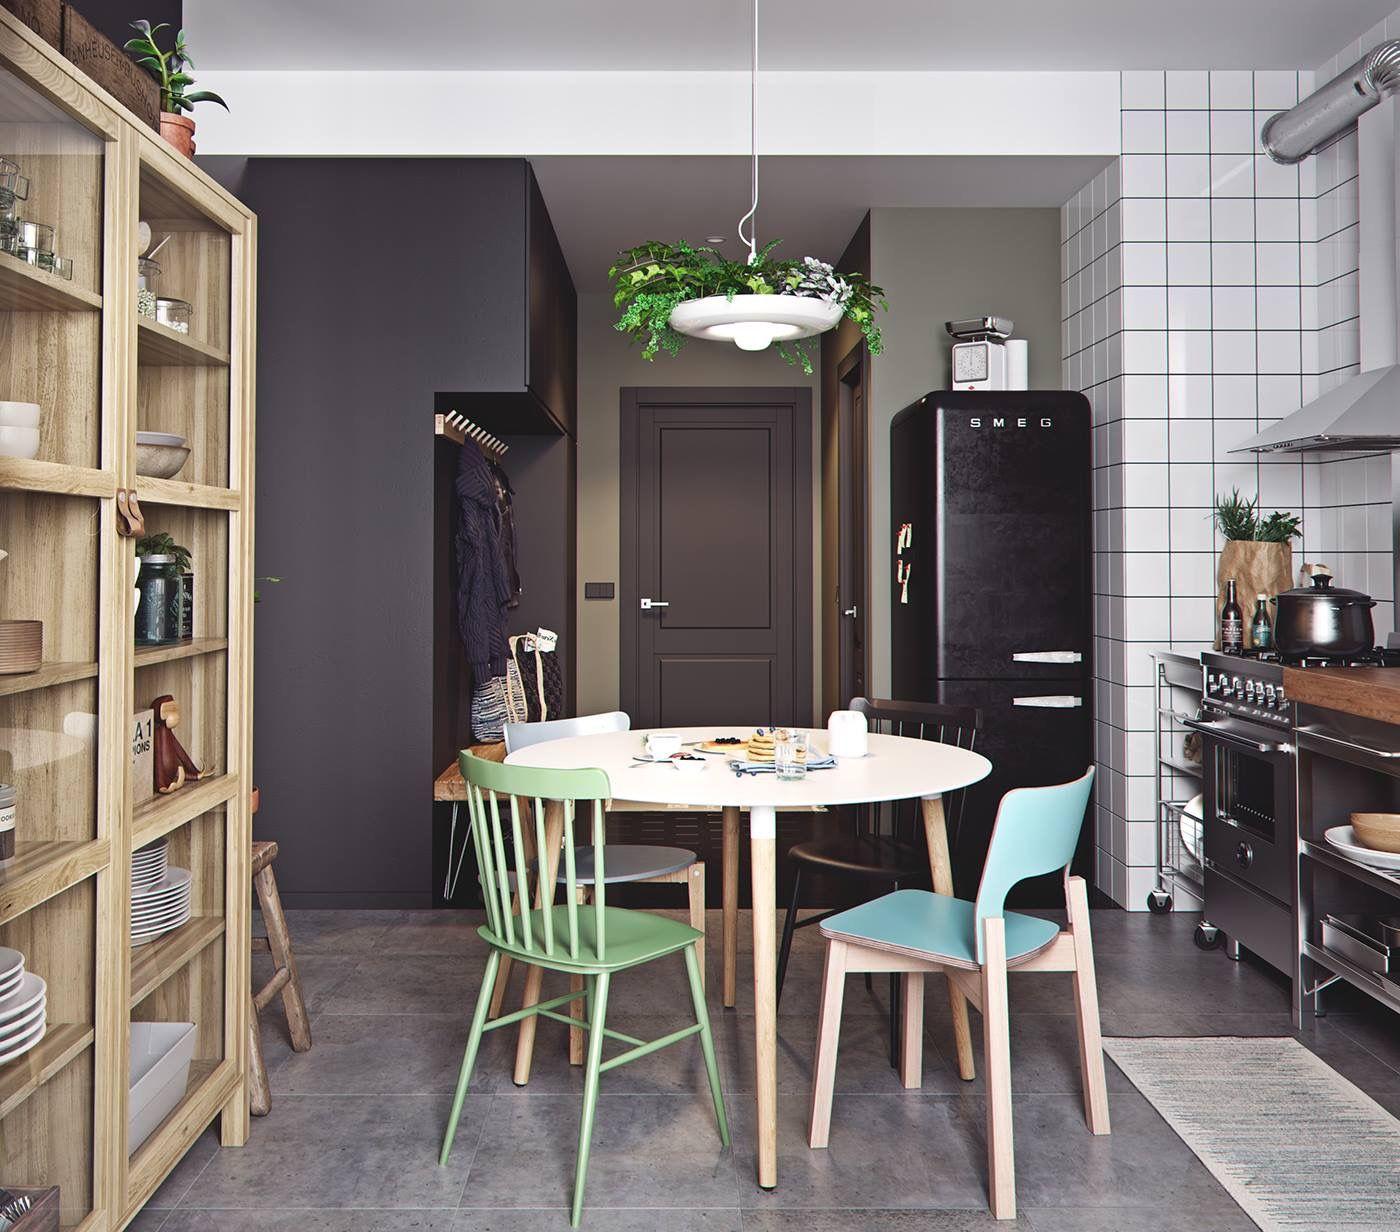 Explore Dark Interiors Scandinavian Interiors and more